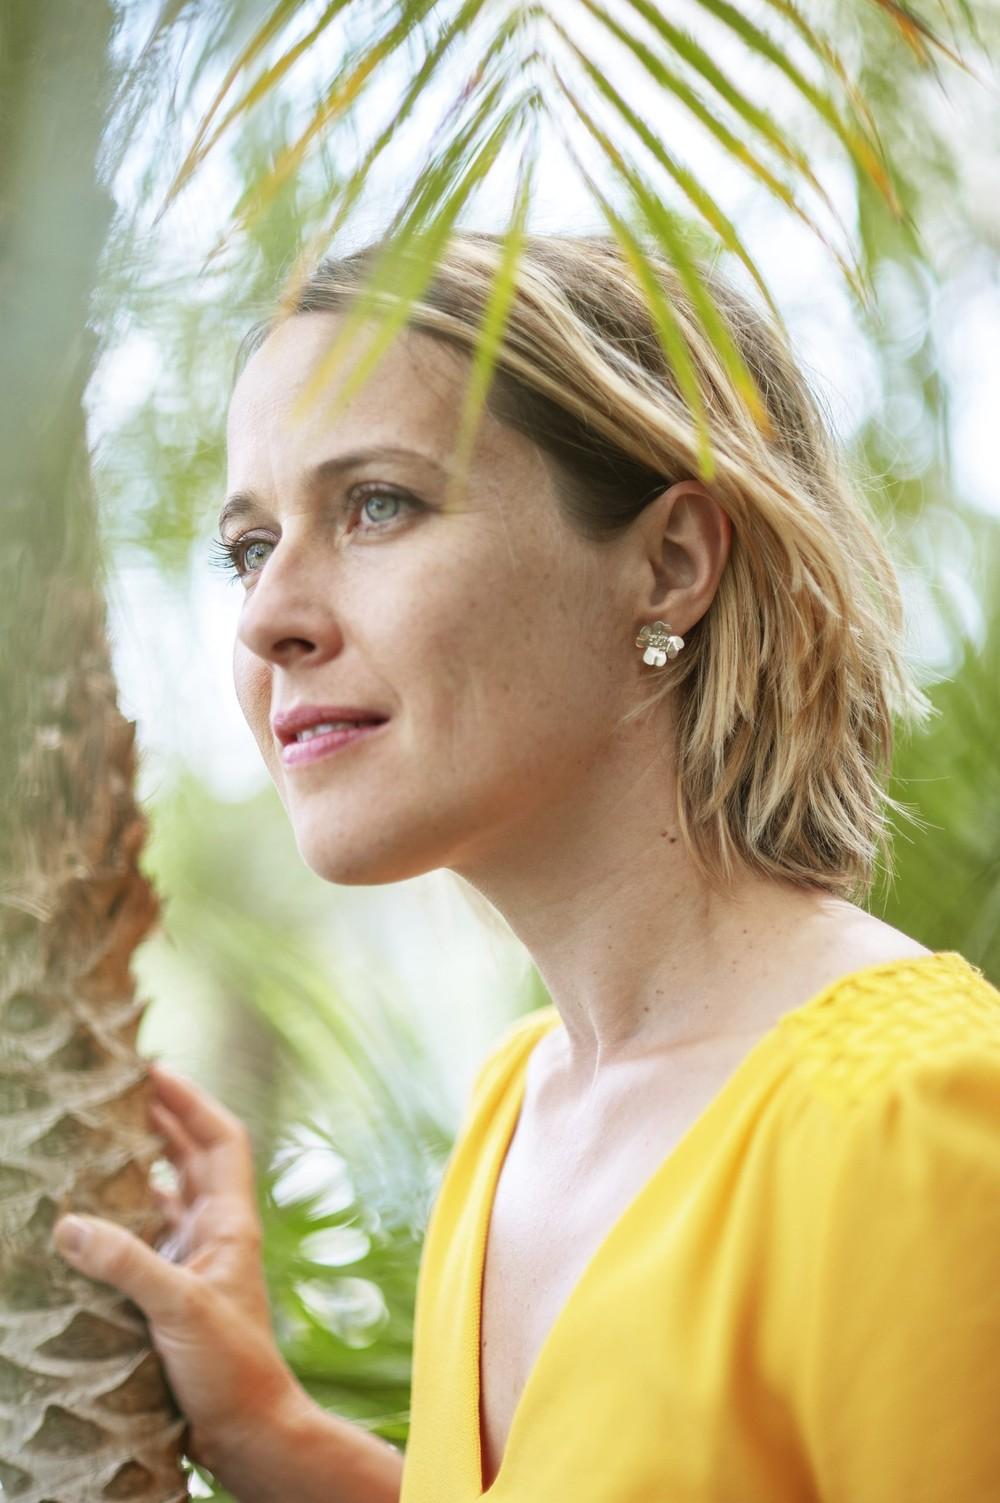 Boucles d'oreilles mesua ferrea - Elle & Sens